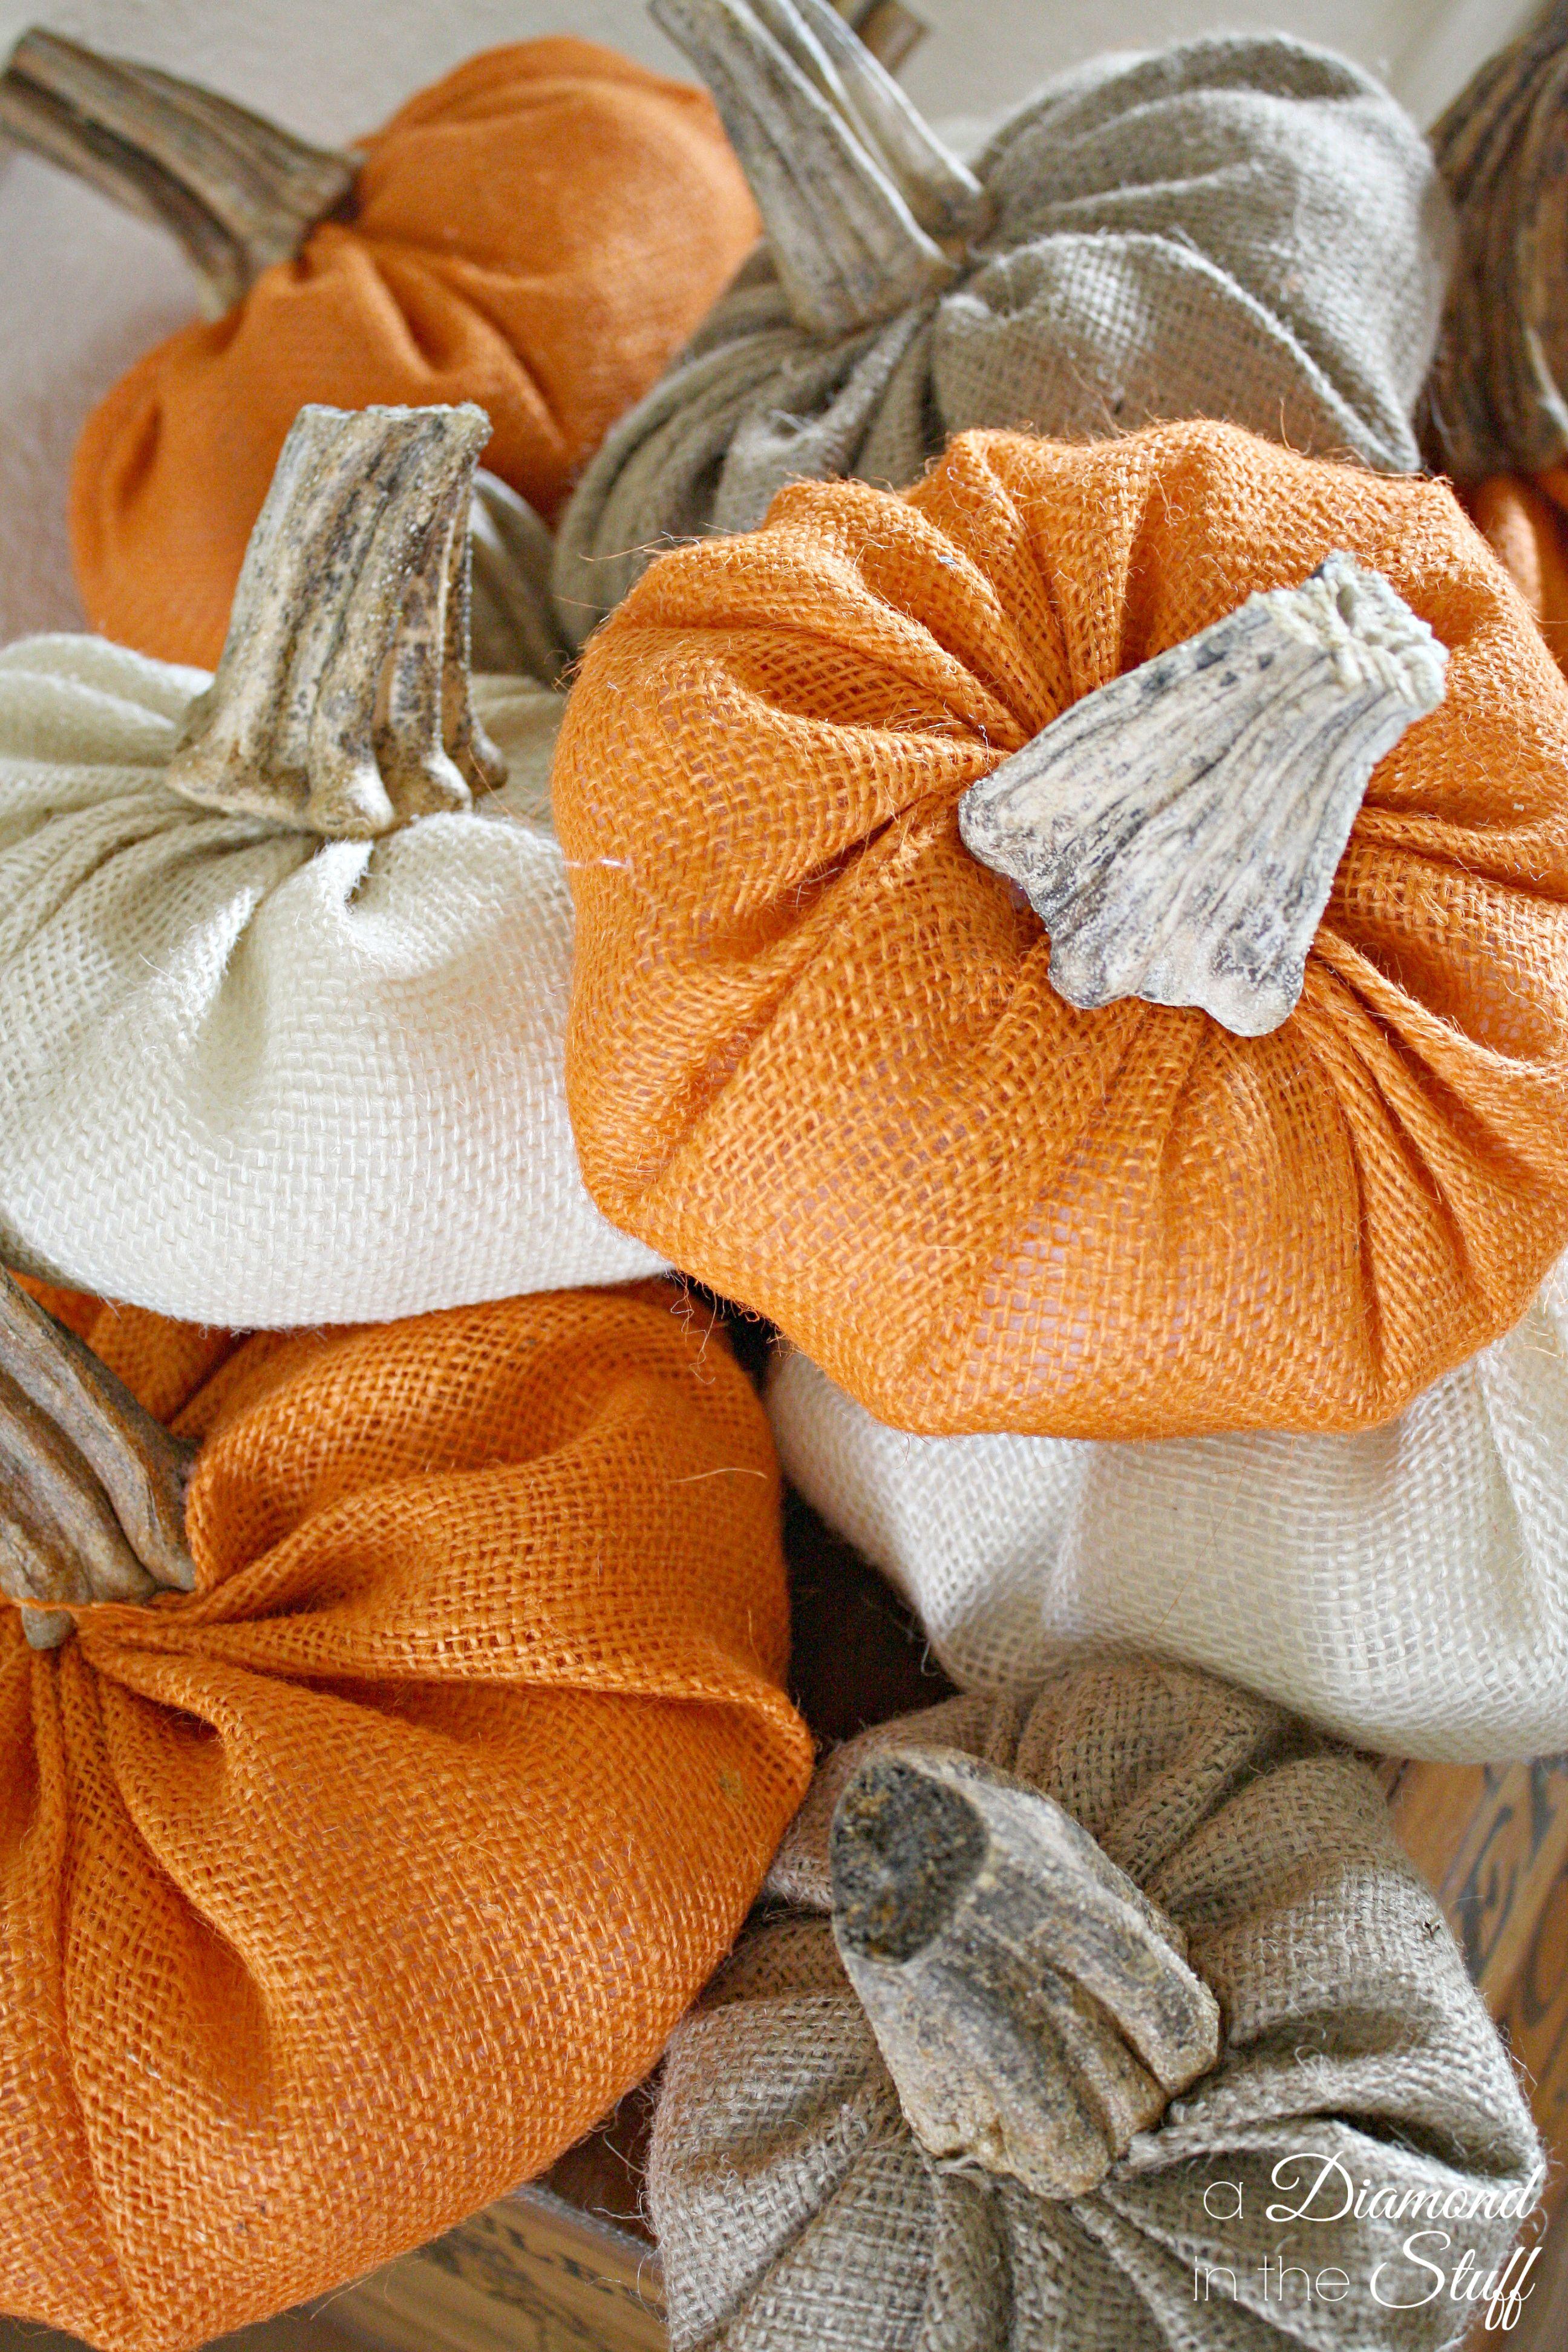 Pumpkin stems for crafts - Pumpkin Stems For Crafts 9